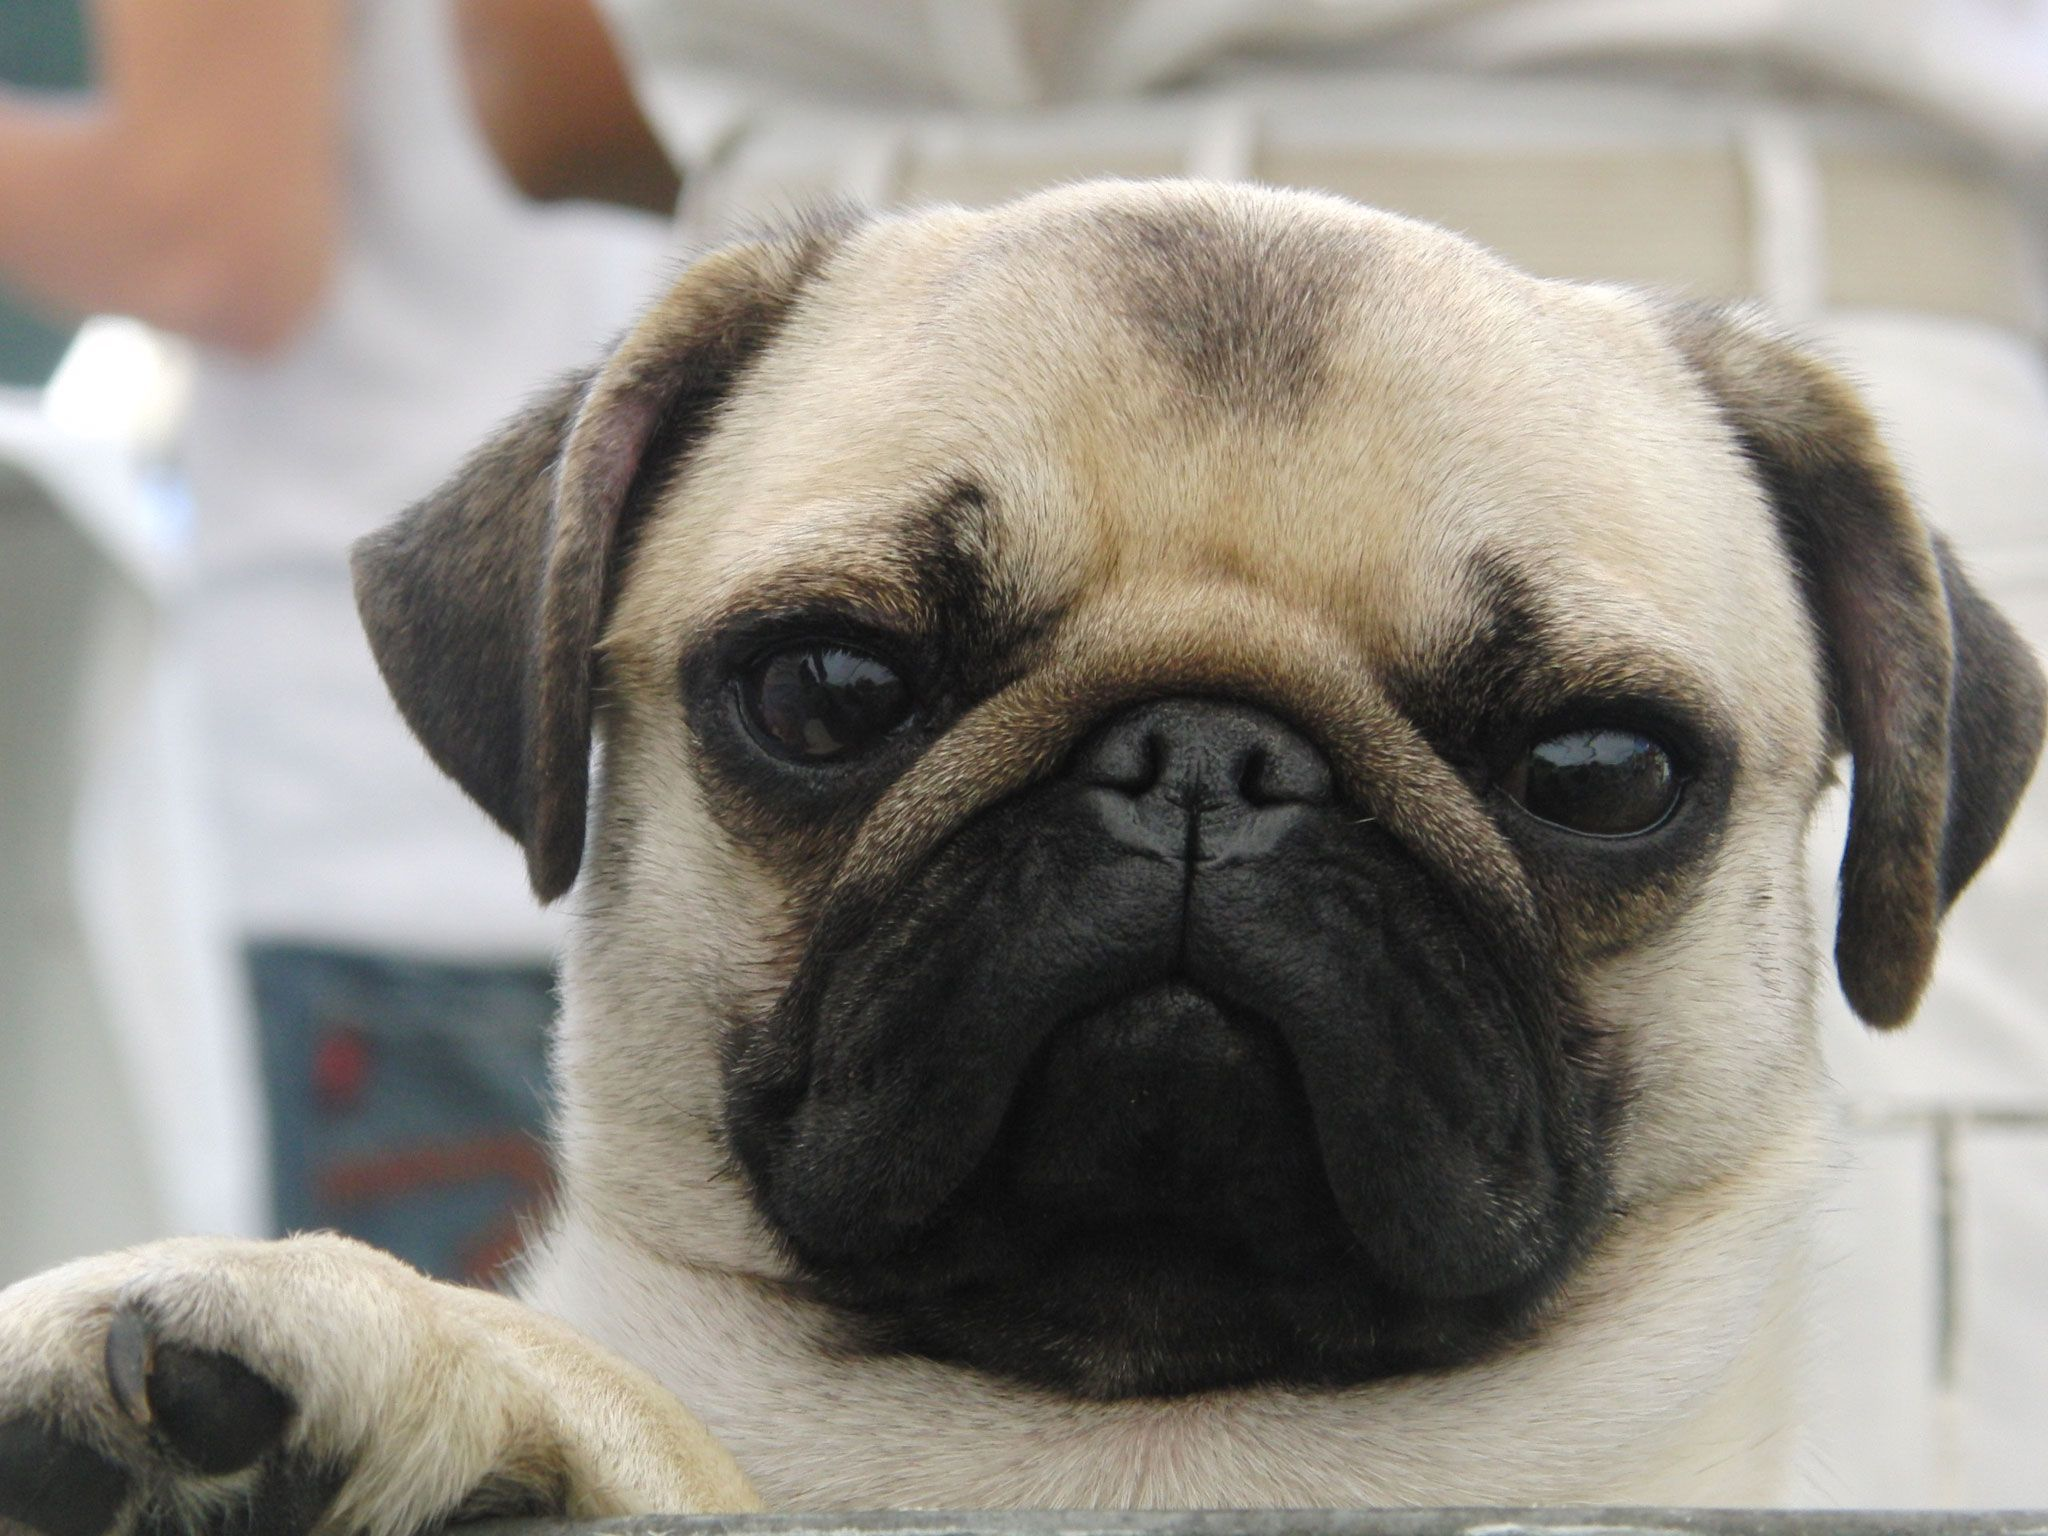 Cute Black Pug Wallpaper iPhone HD Animal Wallpaper for